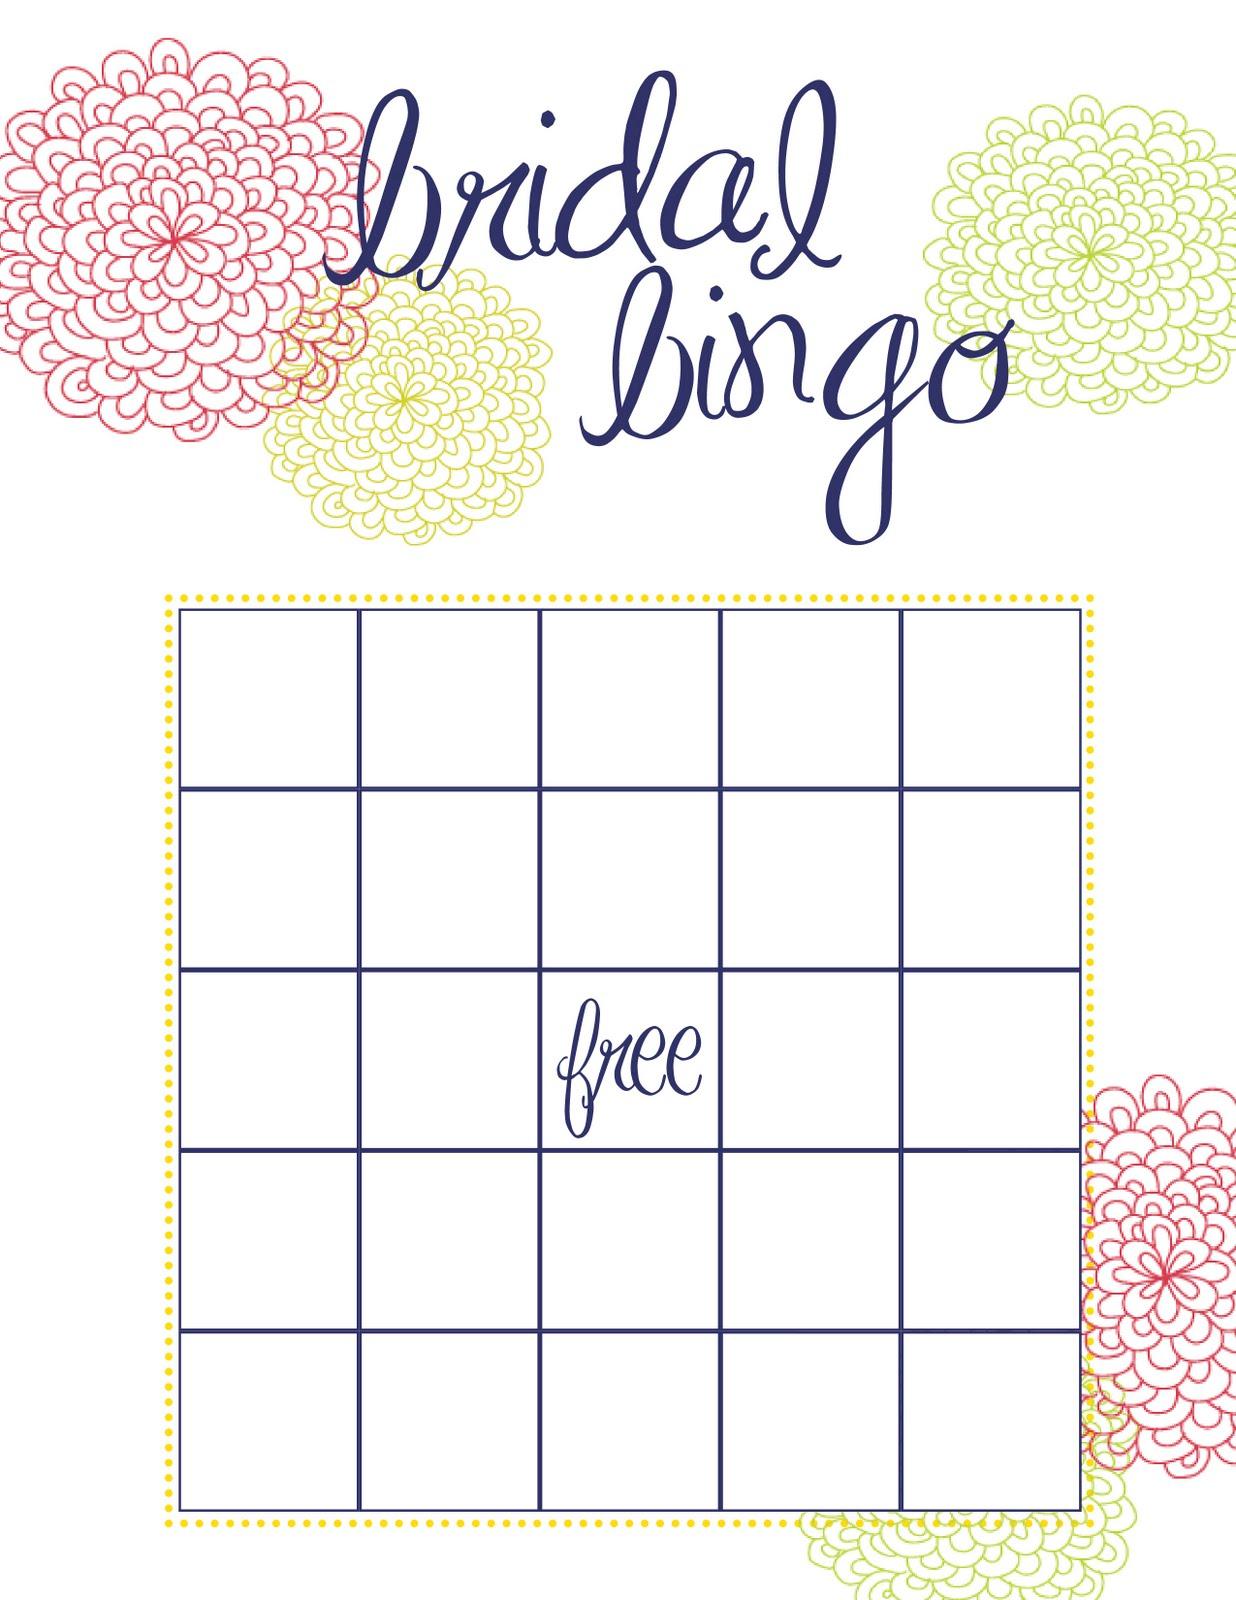 Free Printable Bridal Shower Bingo - Image Cabinets And Shower - Free Printable Bridal Shower Bingo